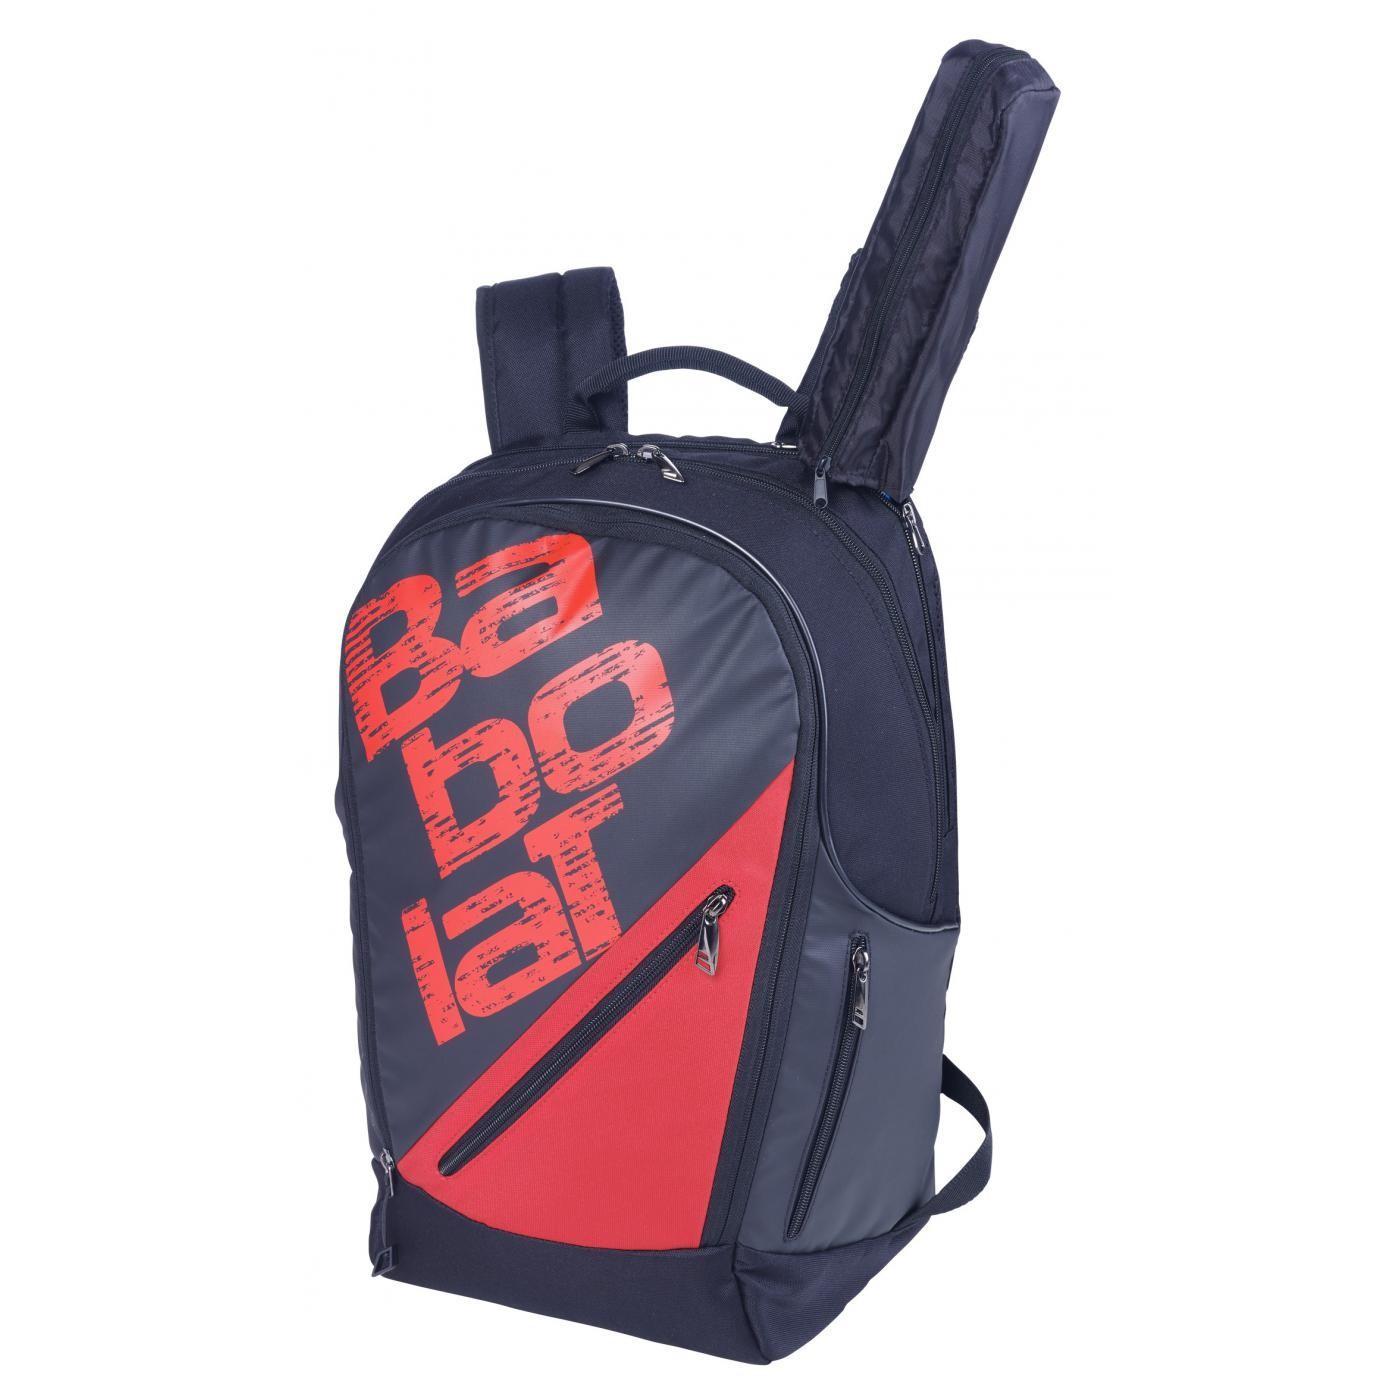 Plecak tenisowy Babolat Team Expandable Backpack Black/Red